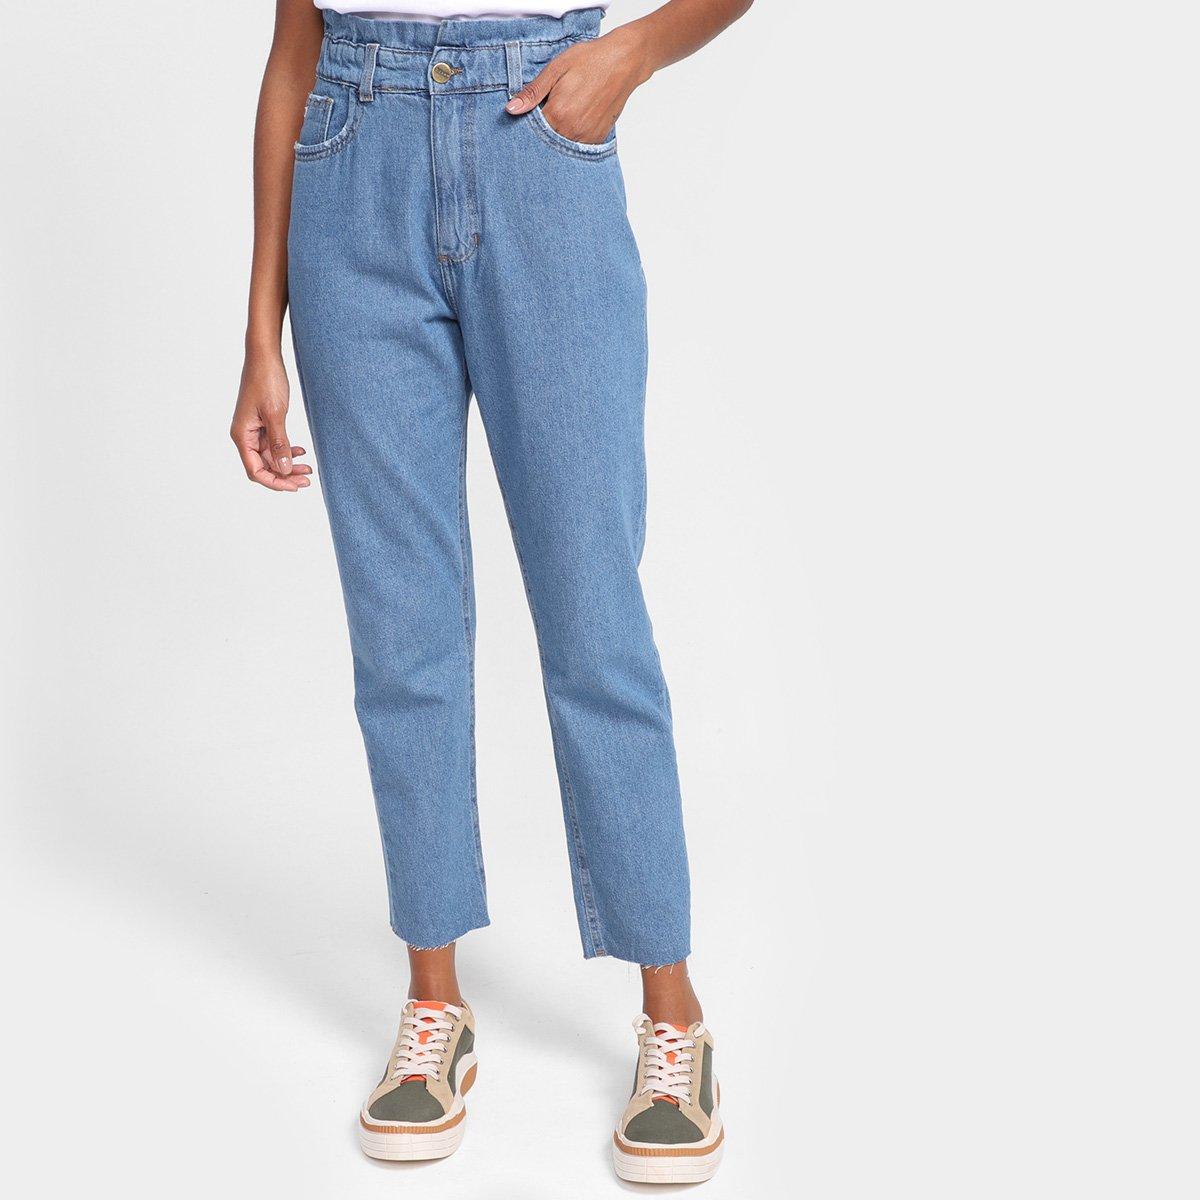 Calça Jeans Dzarm Mom Jeans Feminina